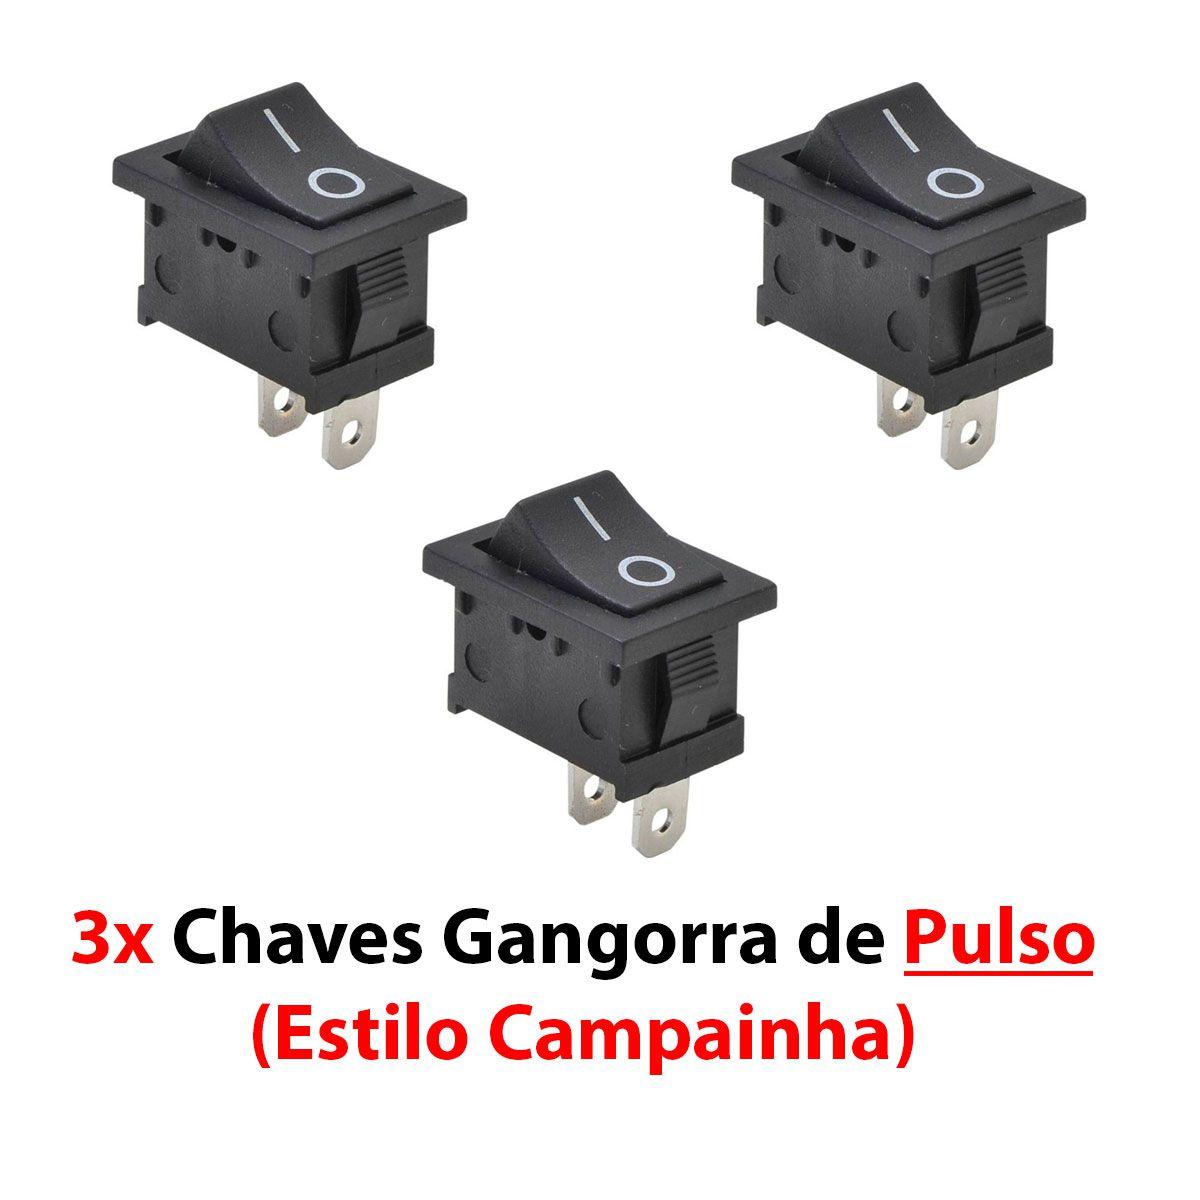 3x Chave Gangorra de PULSO ( Campainha )- 2 Terminais 15x20mm 6A - Cor Preta KCD1-111-2